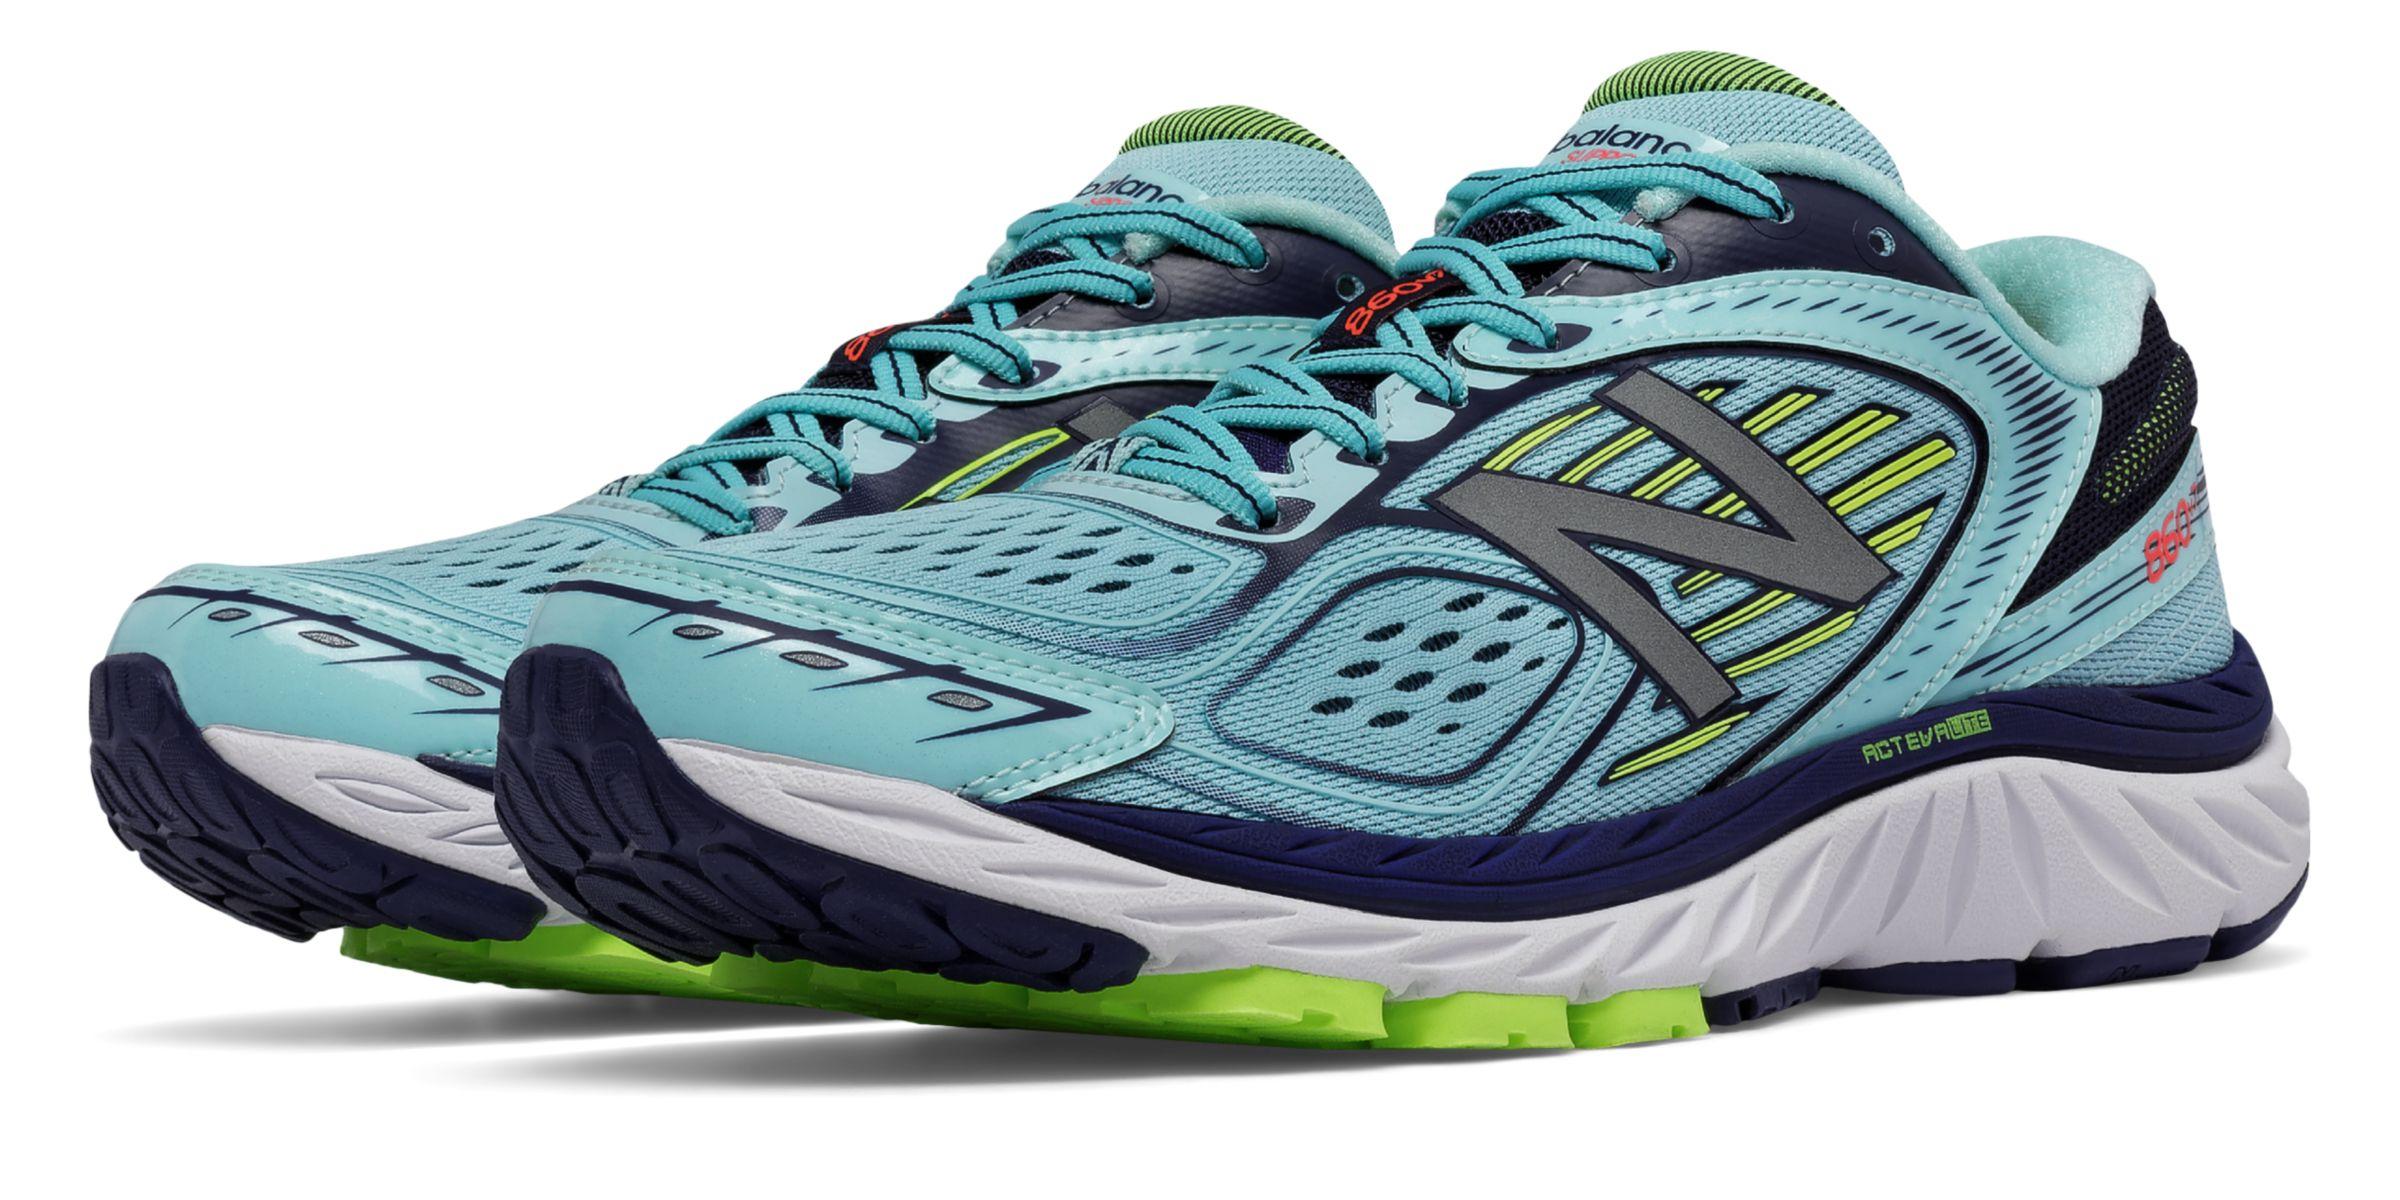 Discount Women\u0027s New Balance Running Shoes | Shop New Balance 990v4, 860v4  \u0026 More | Joe\u0027s New Balance Outlet